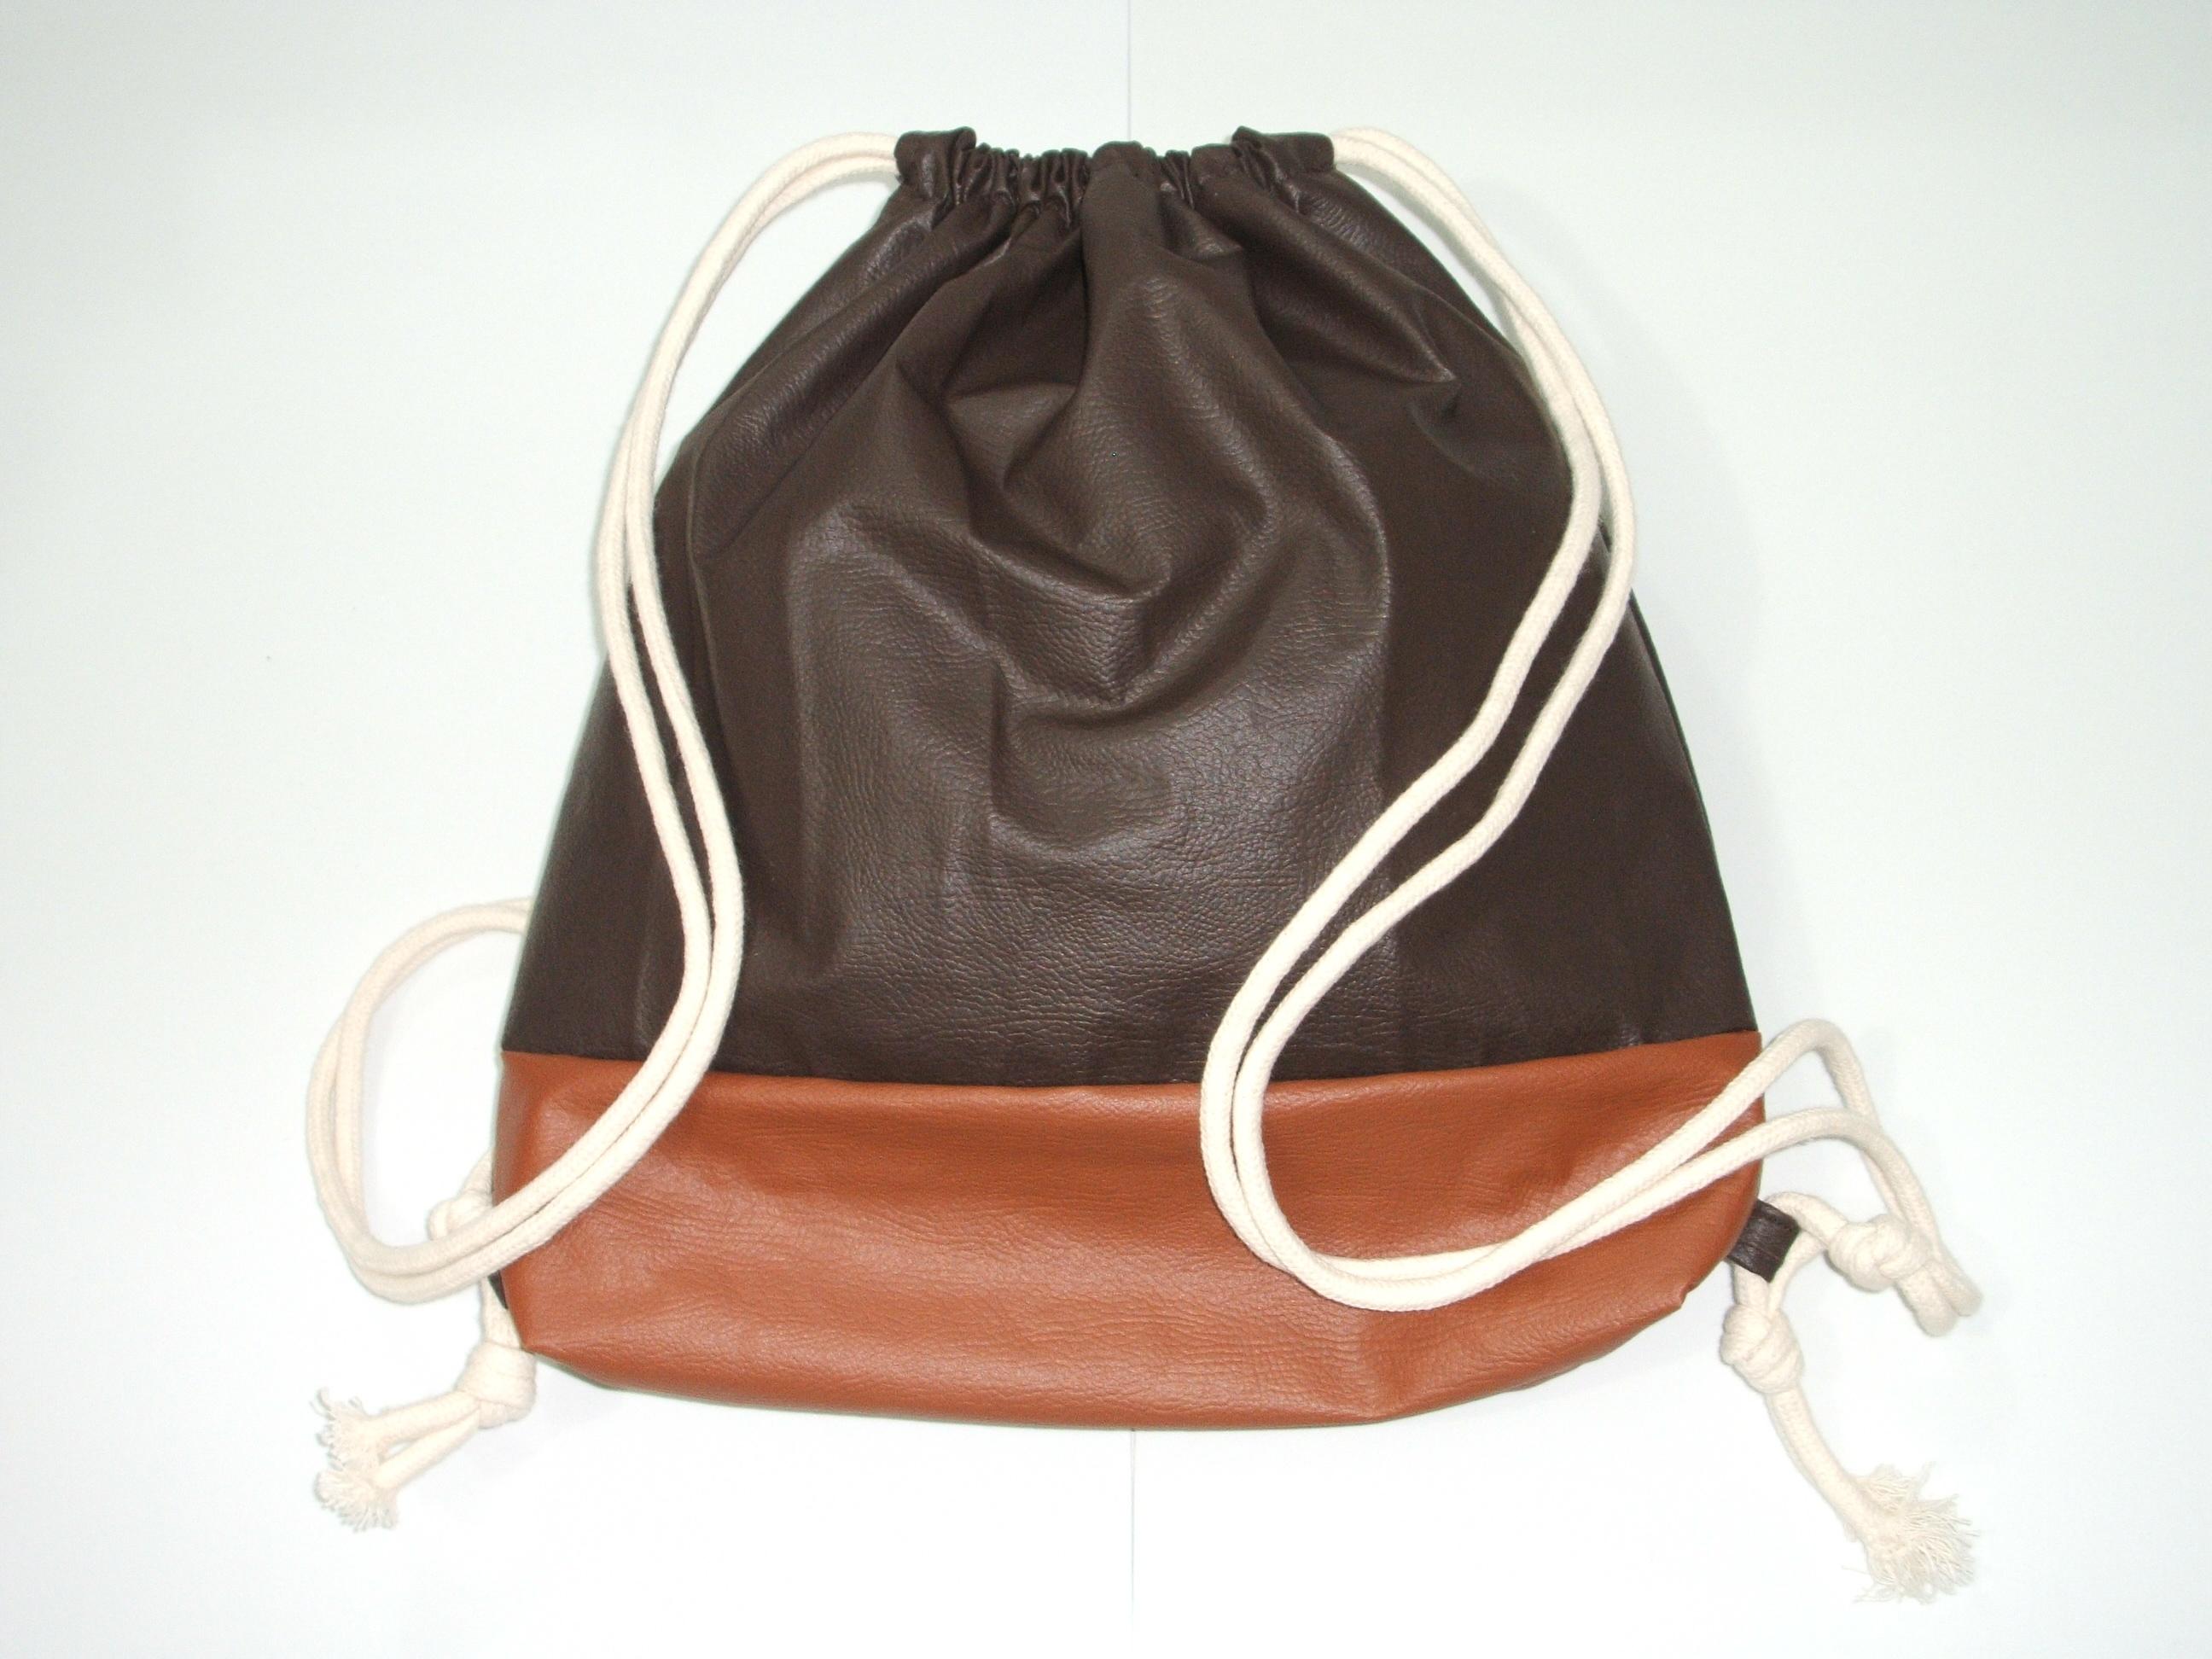 496c84d21 Mochila feminina fashion All Brown no Elo7 | Dondoca FuLô Mimos&Presentes  (A06E8B)